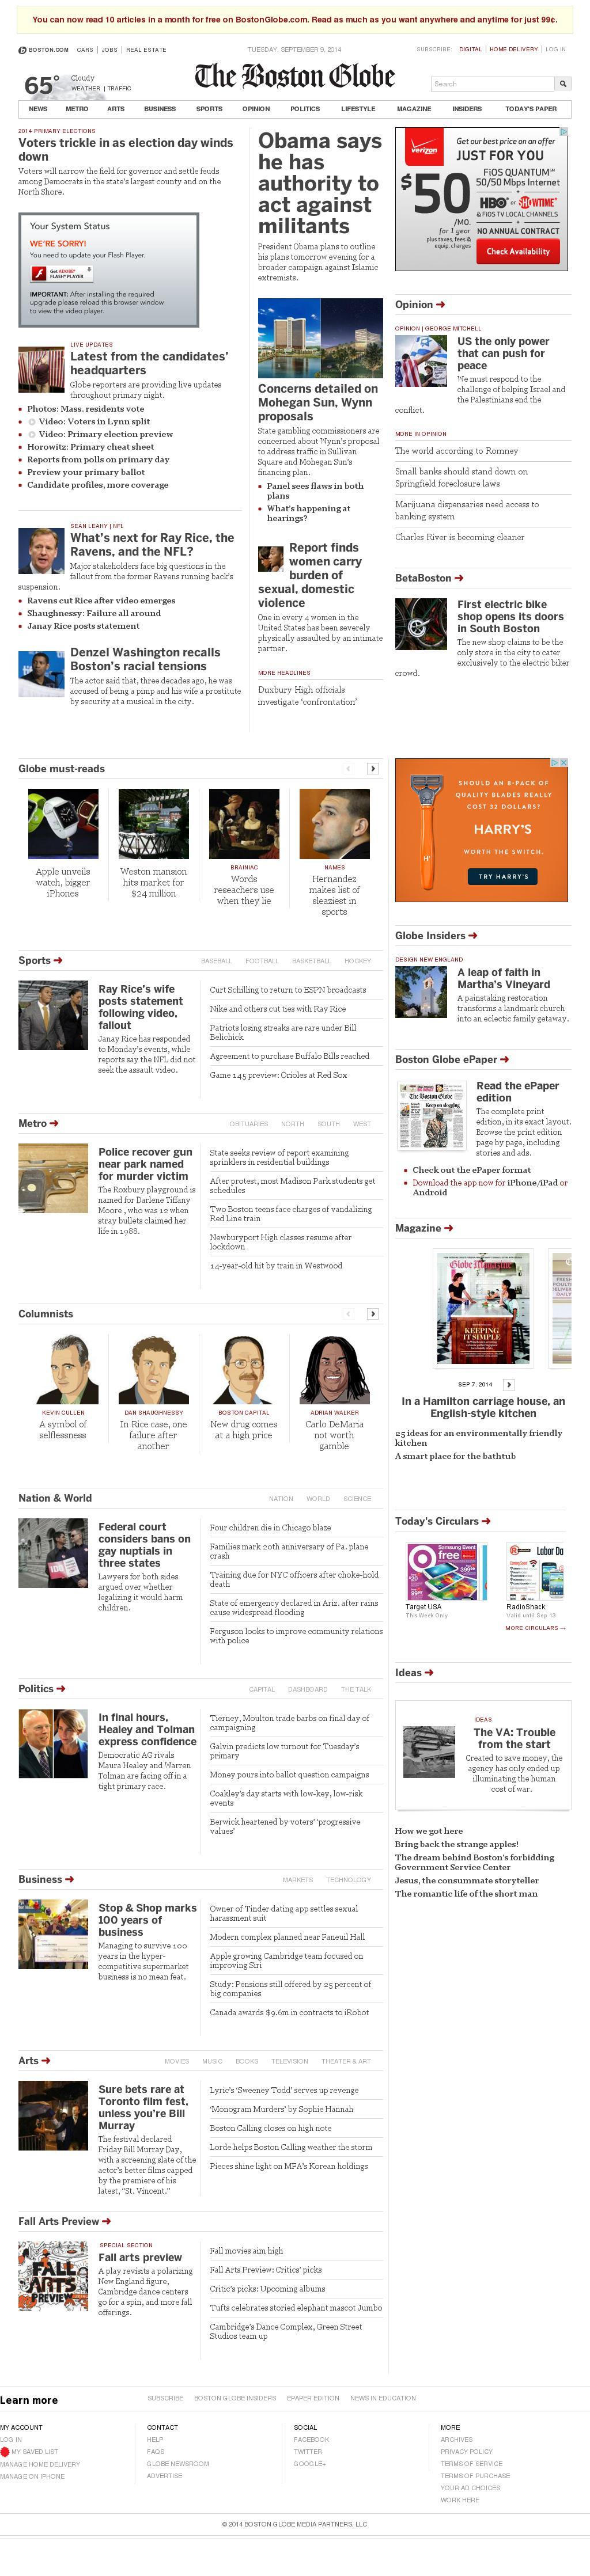 The Boston Globe at Tuesday Sept. 9, 2014, 11:01 p.m. UTC